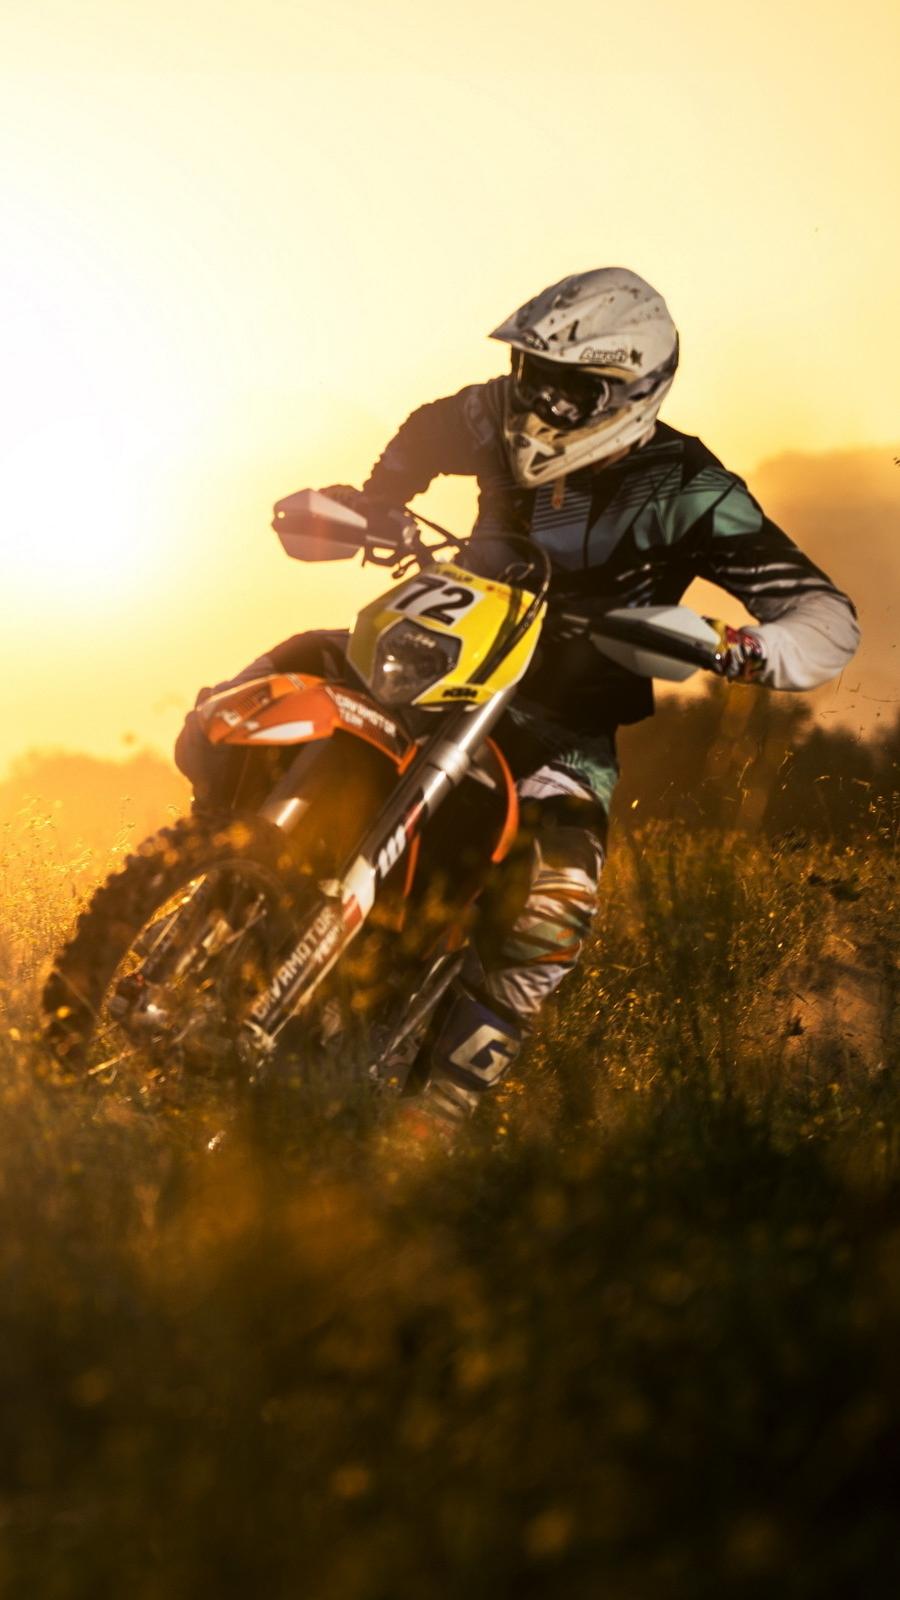 Dirtbike-in-Mud-iPhone-Wallpaper - IPhone Wallpapers